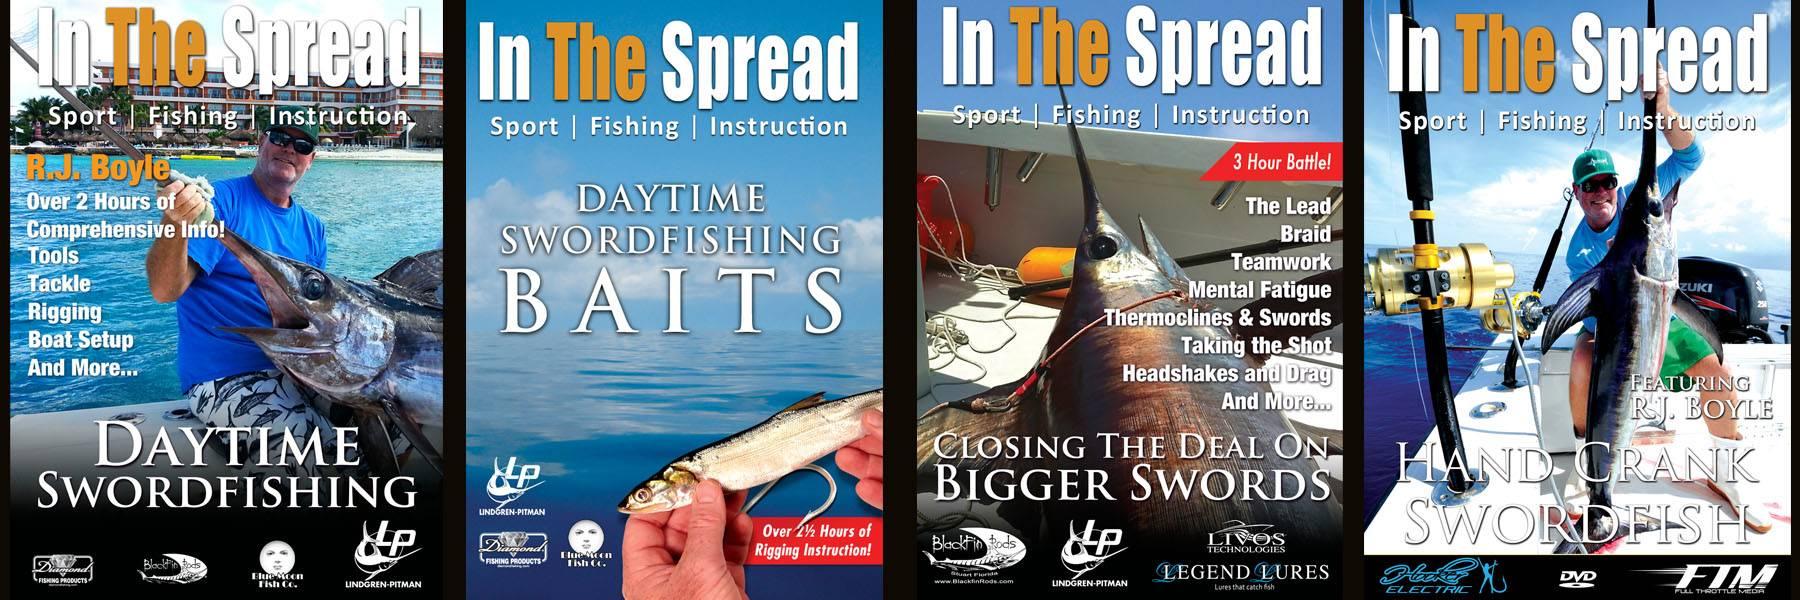 Swordfish - In The Spread